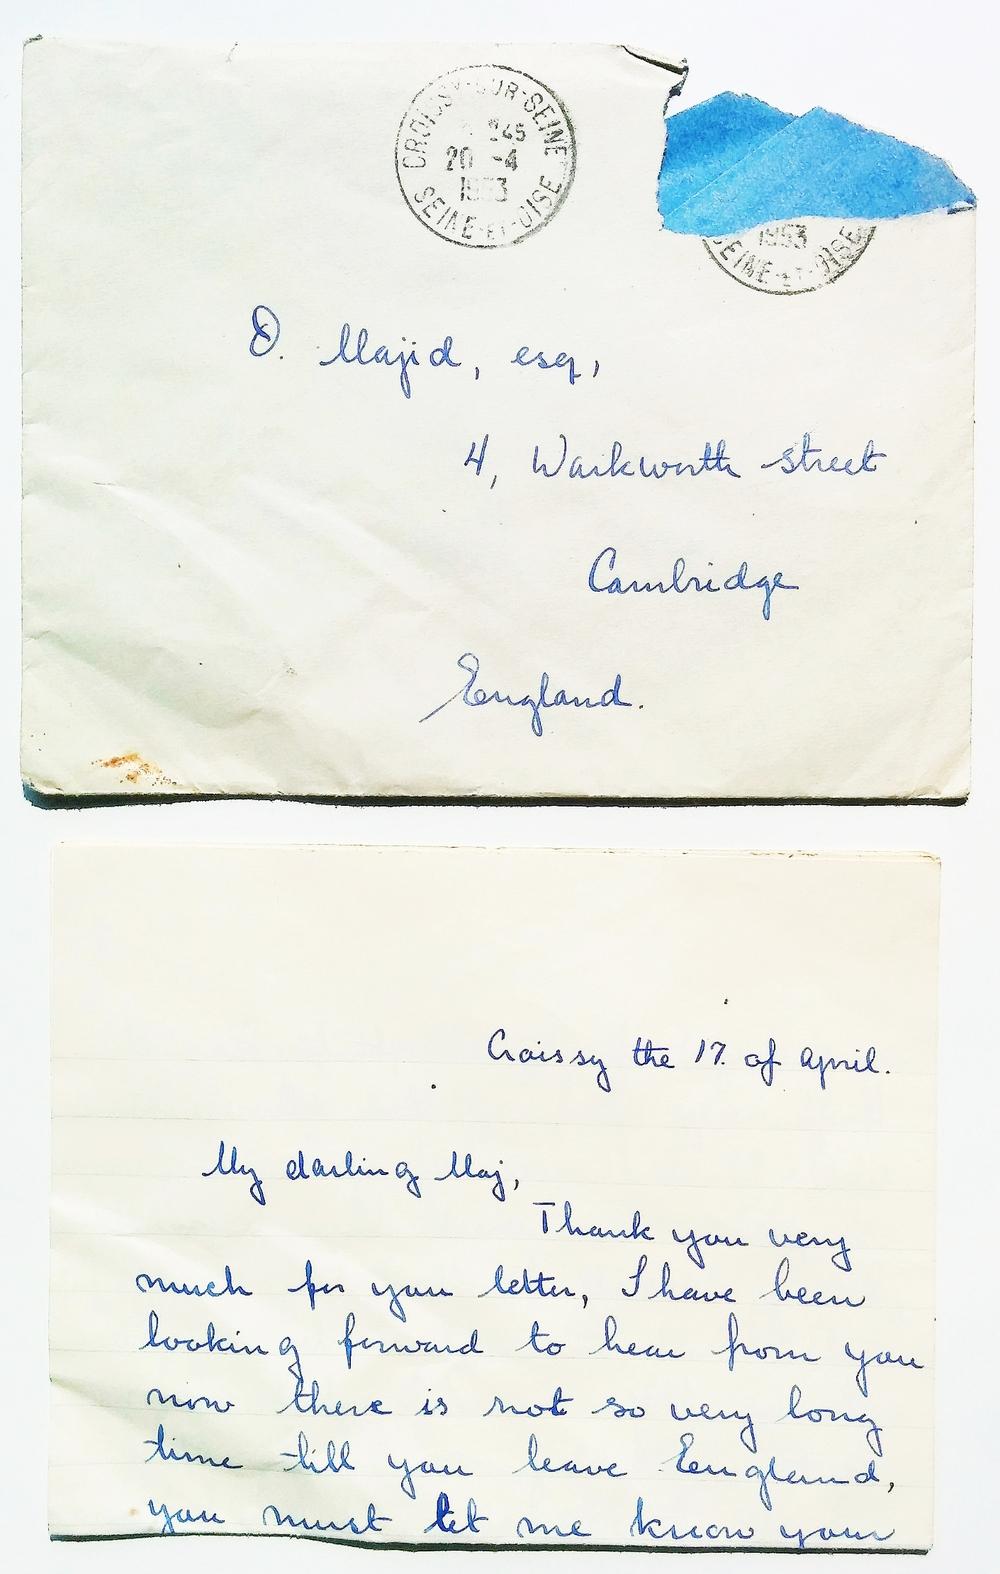 April 17th, 1953